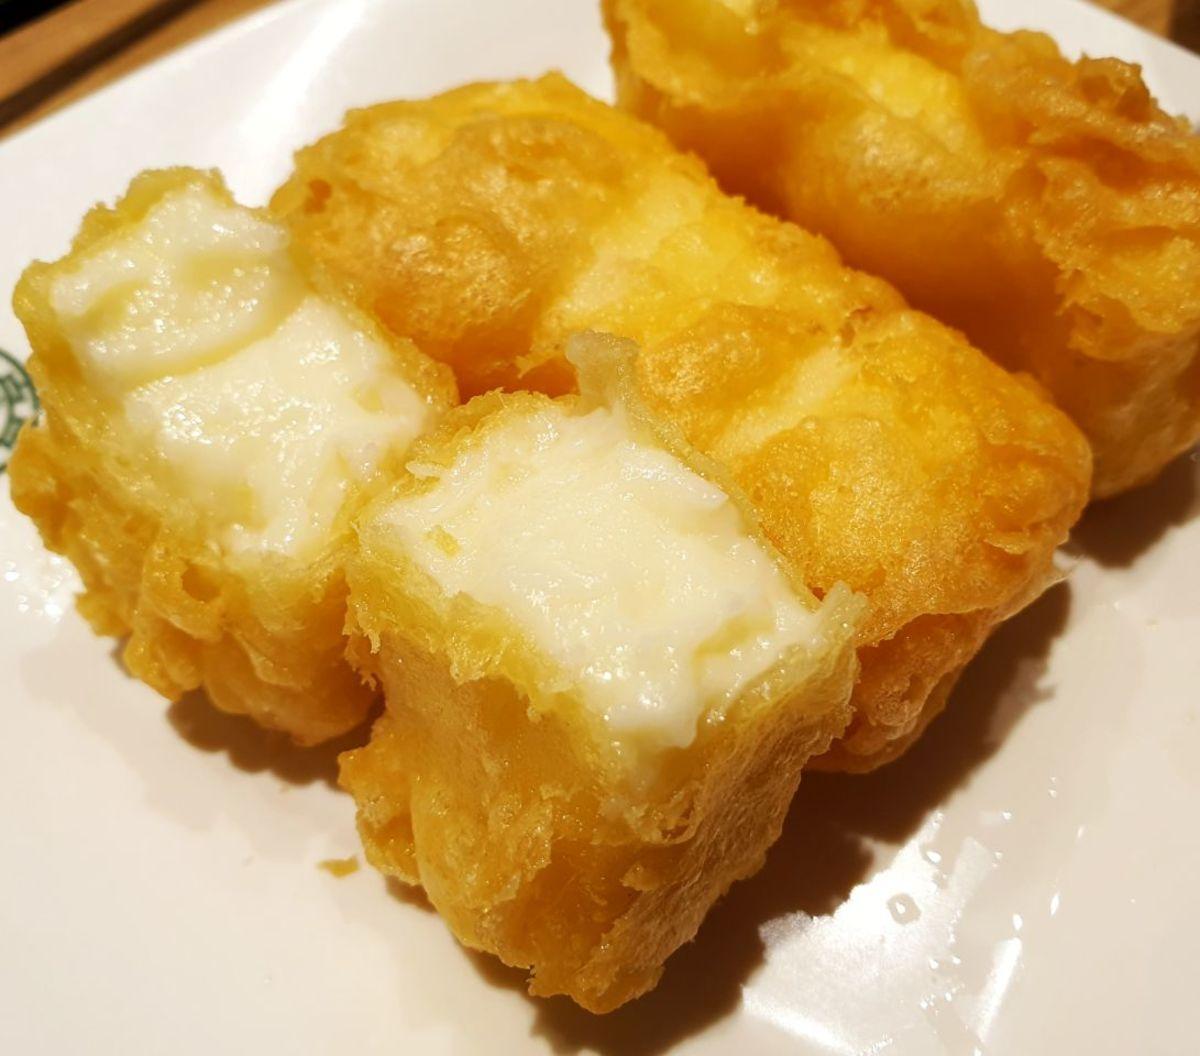 Asian-Style Fried Milk Dessert (Leche Frita)